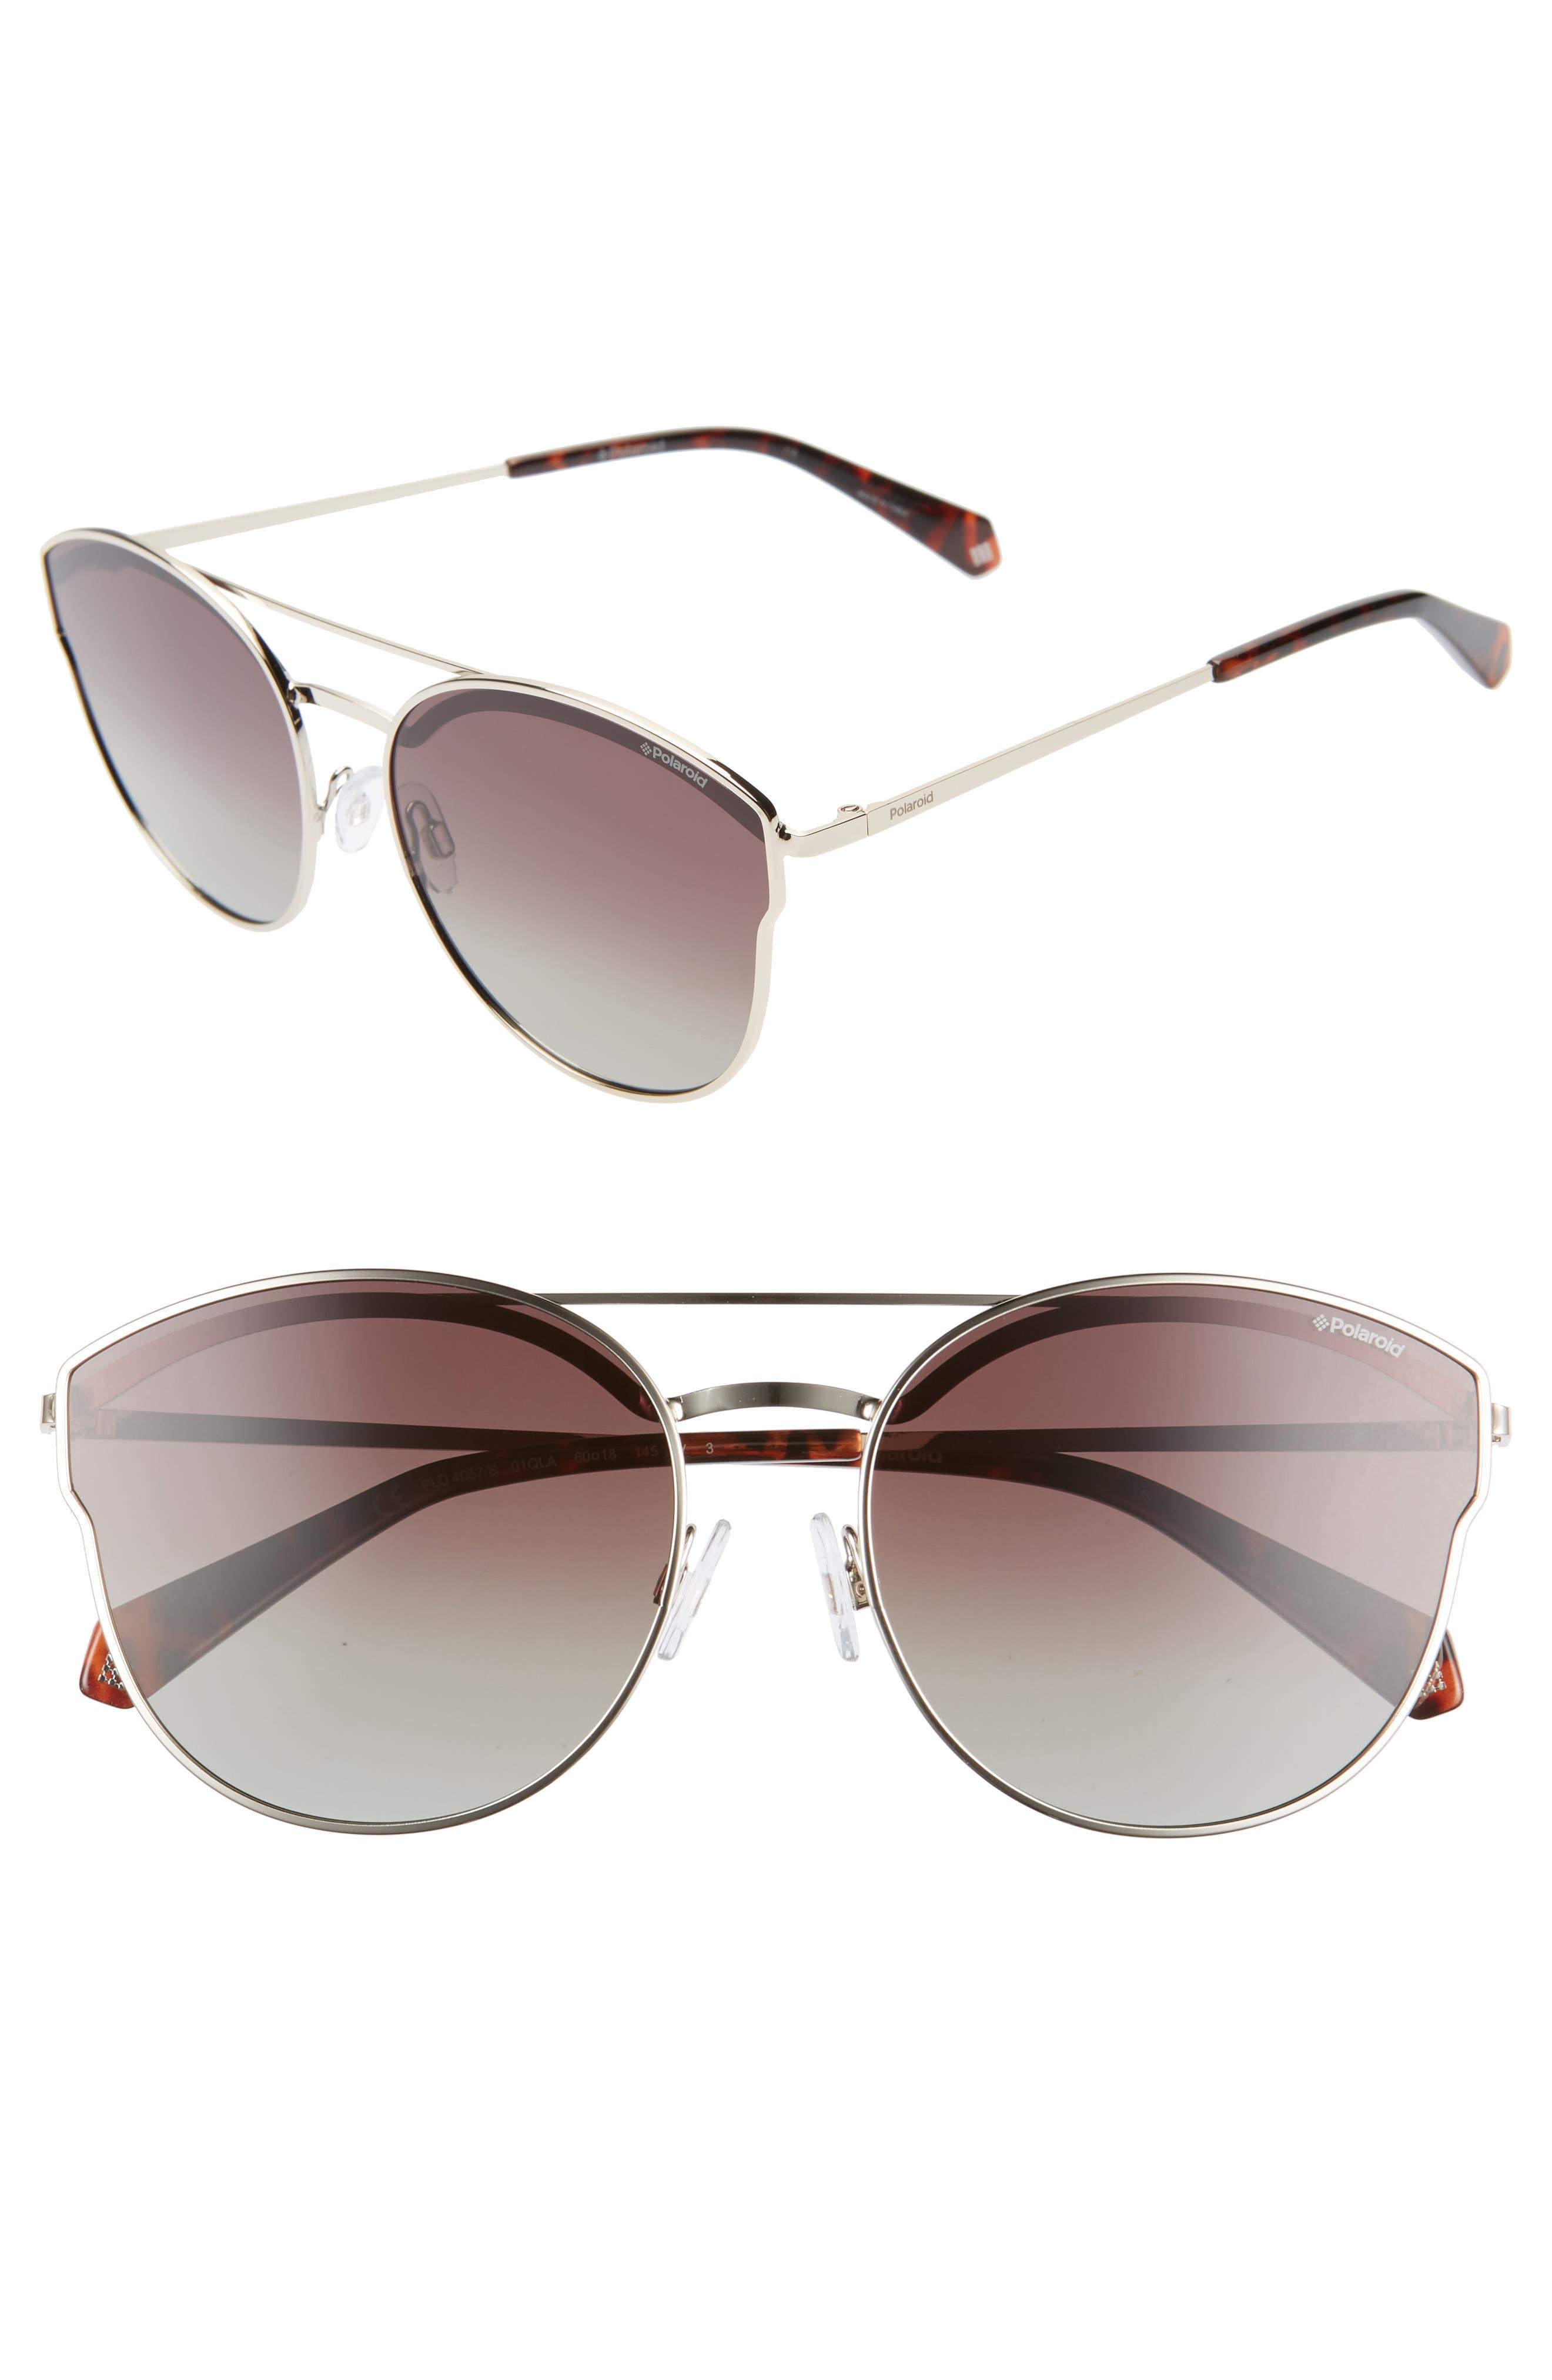 Polaroid 60Mm Polarized Round Aviator Sunglasses - Gold/ Brown